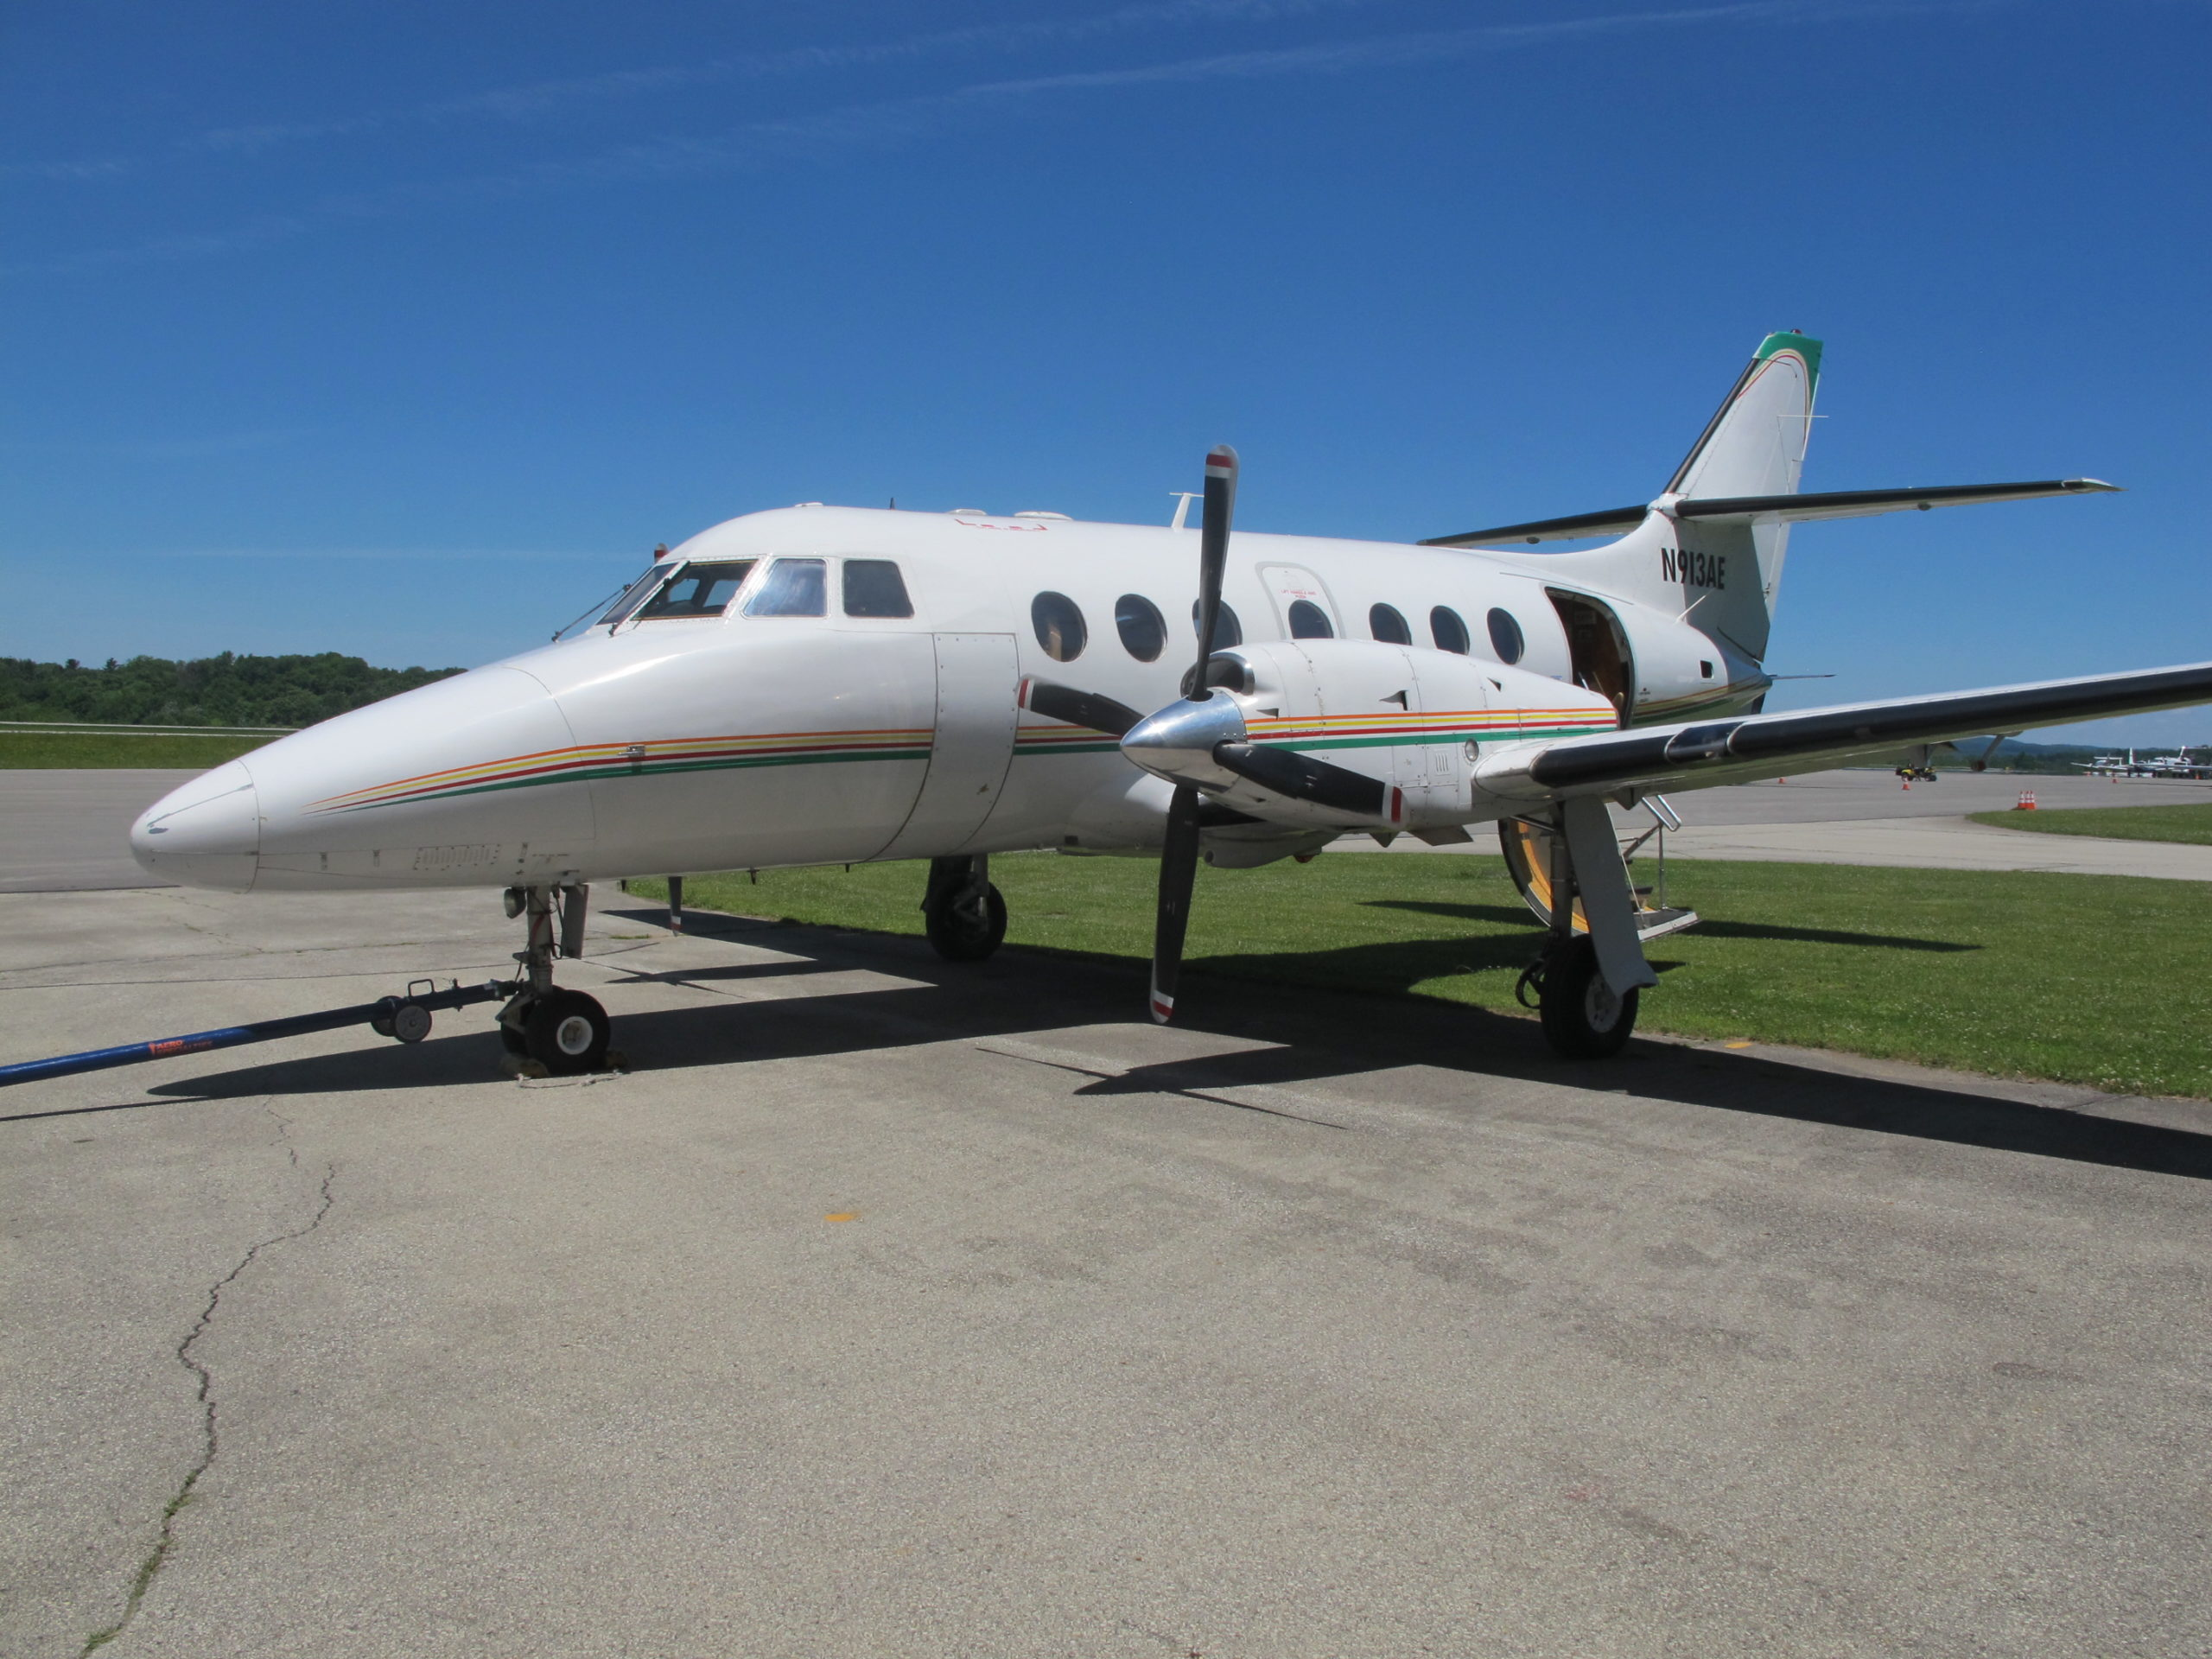 BAE Jetstream 32EP Sn 913